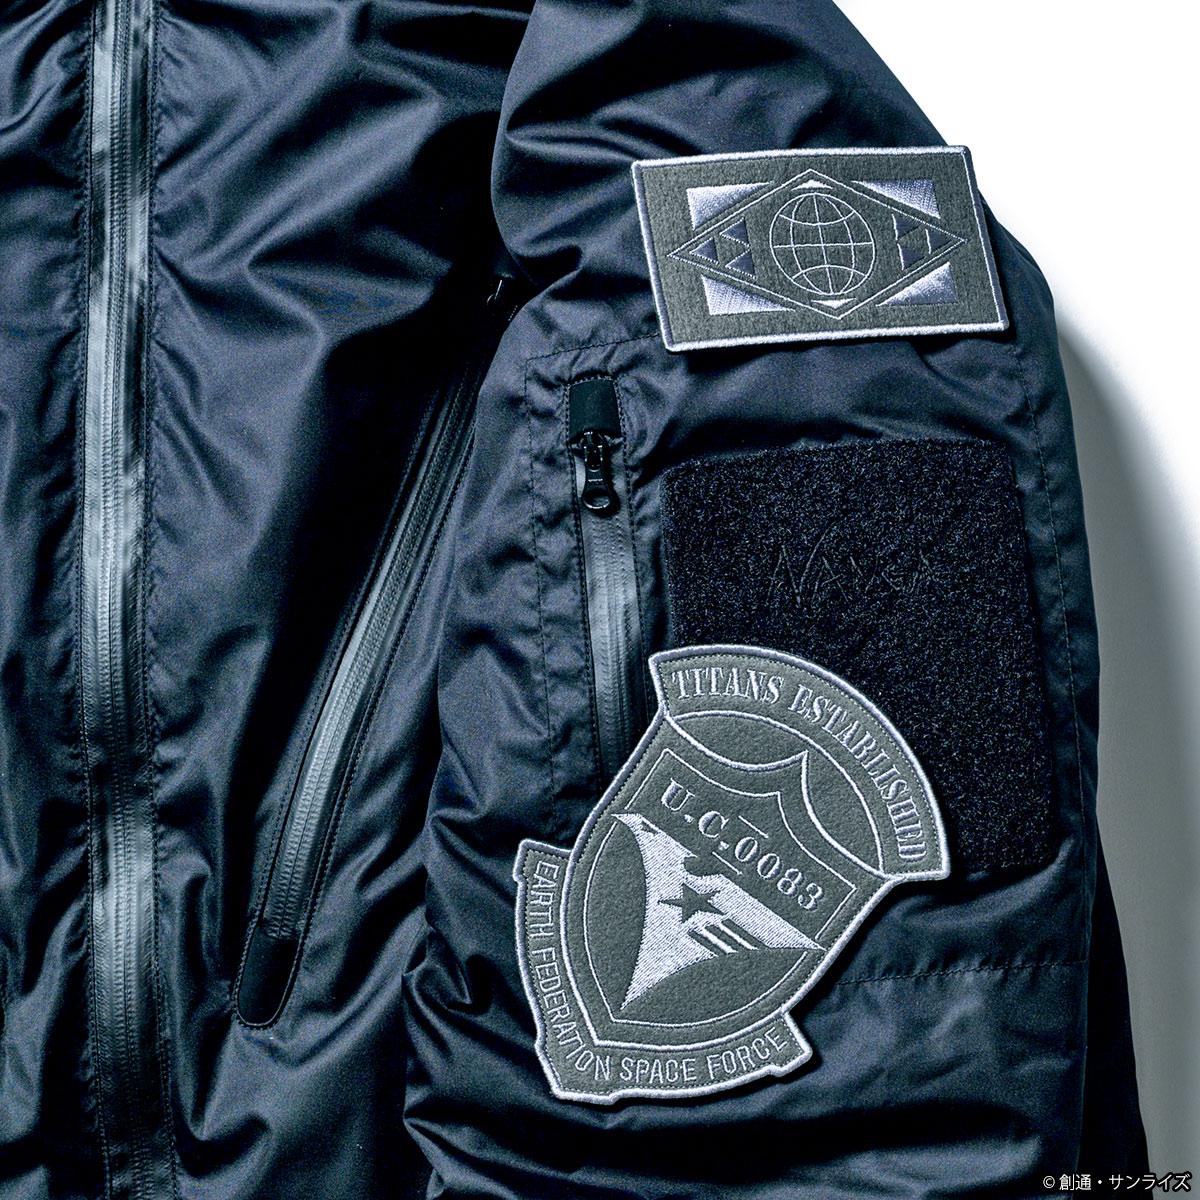 STRICT-G × NANGA 『機動戦士Zガンダム』35周年記念 ダウンジャケット ティターンズモデル